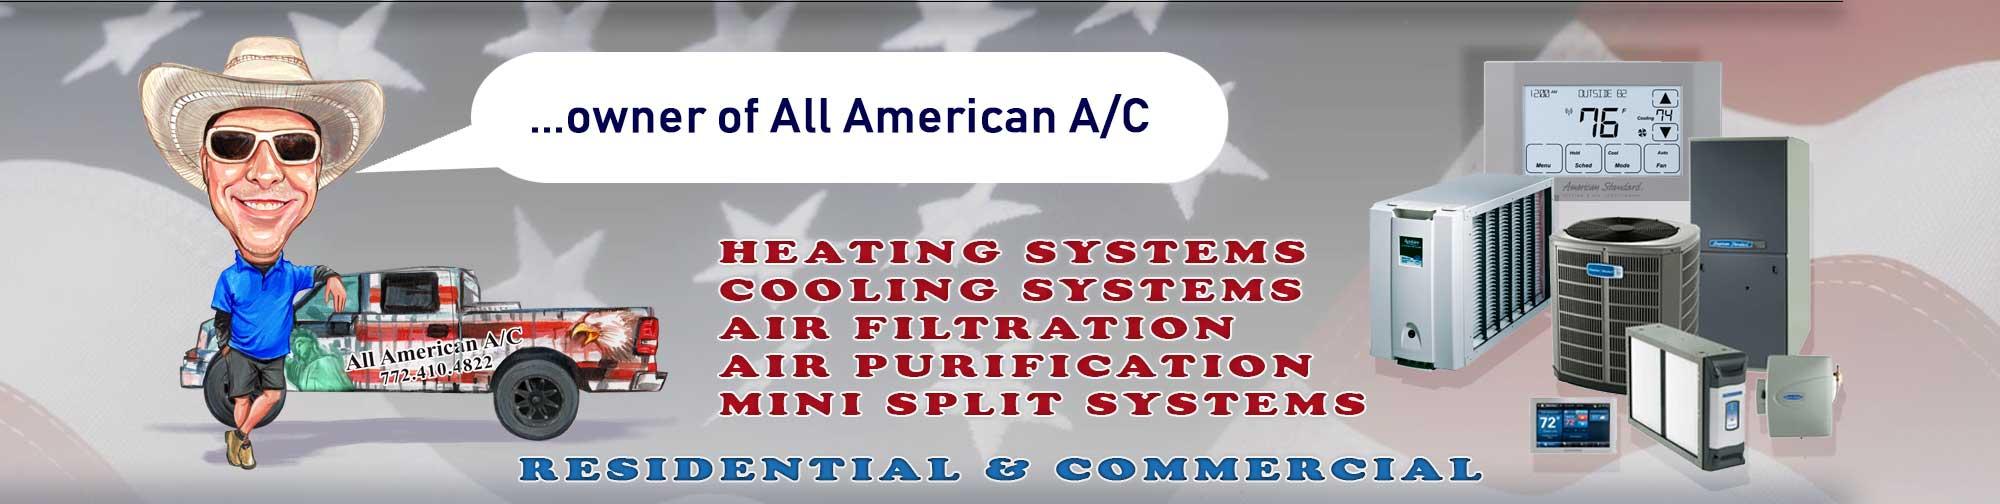 AllAmericanACVeroBreachSlider2b